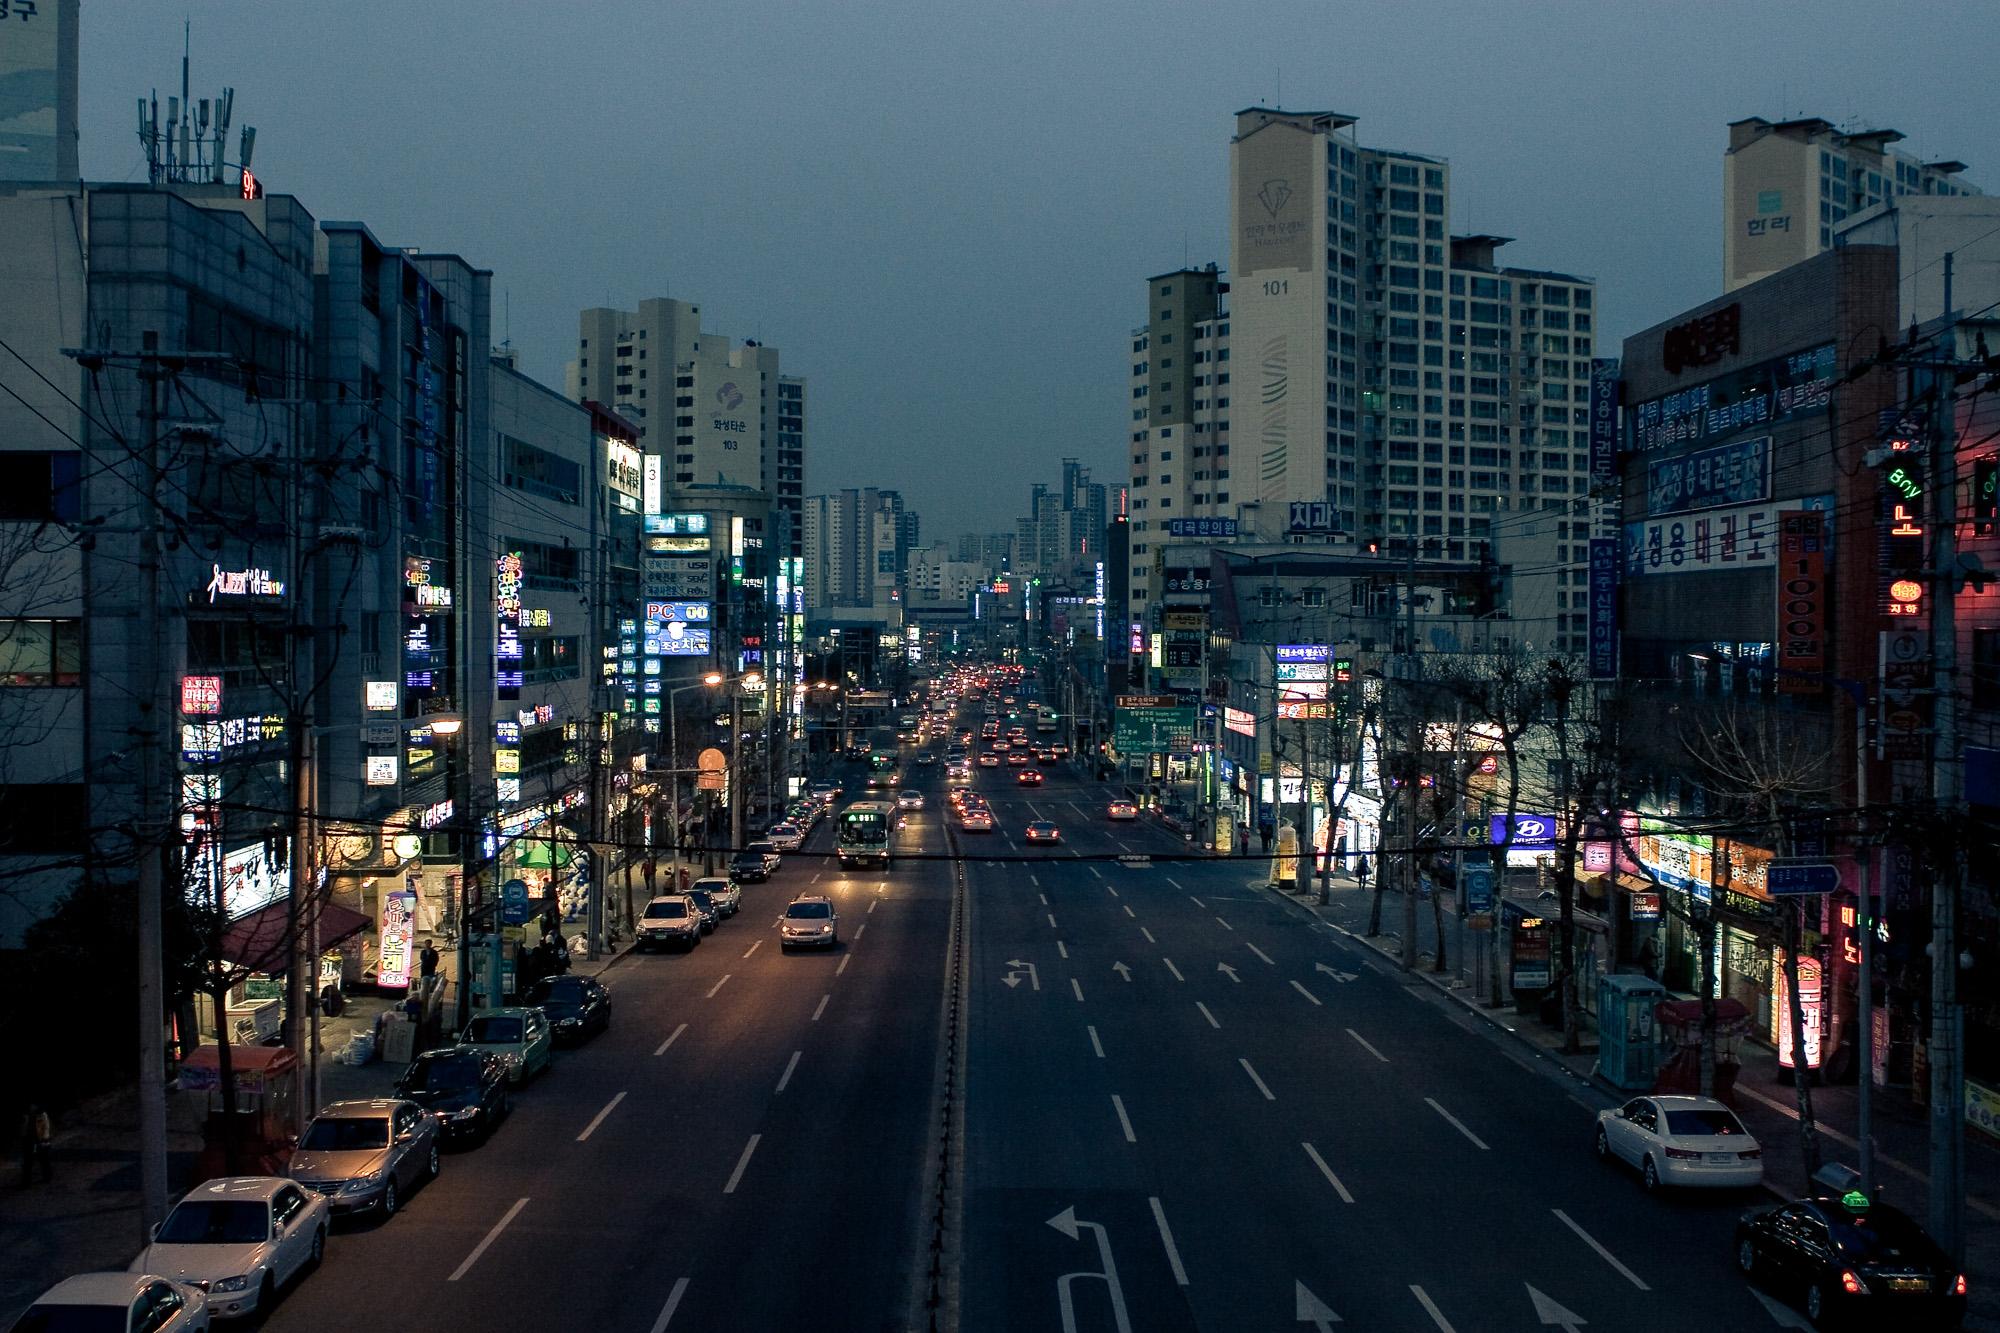 First Night in Korea, Chris Chucas